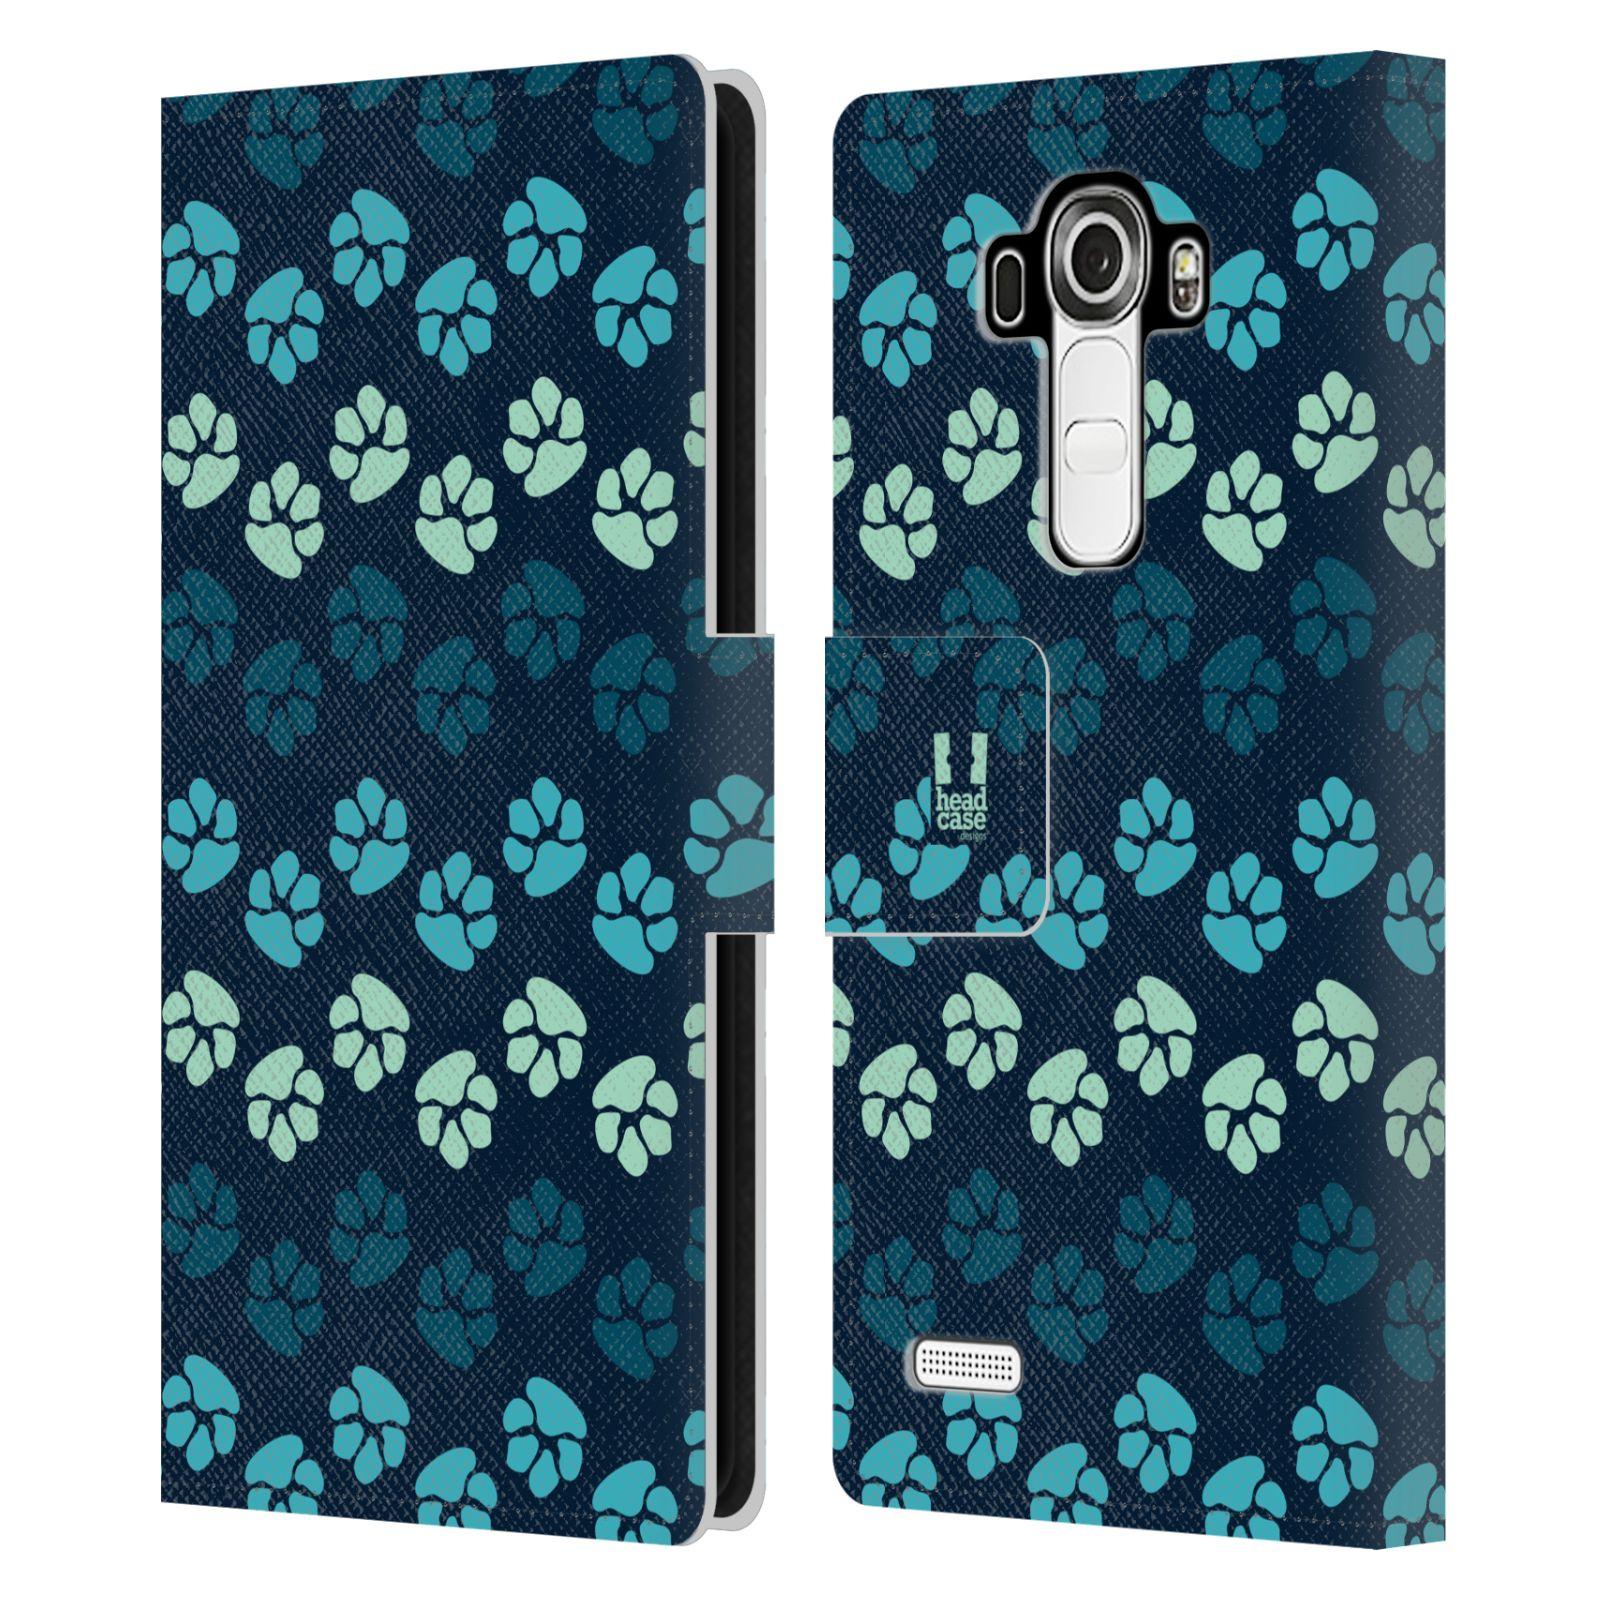 HEAD CASE Flipové pouzdro pro mobil LG G4 (H815) Pejsek ťapky modrá barva